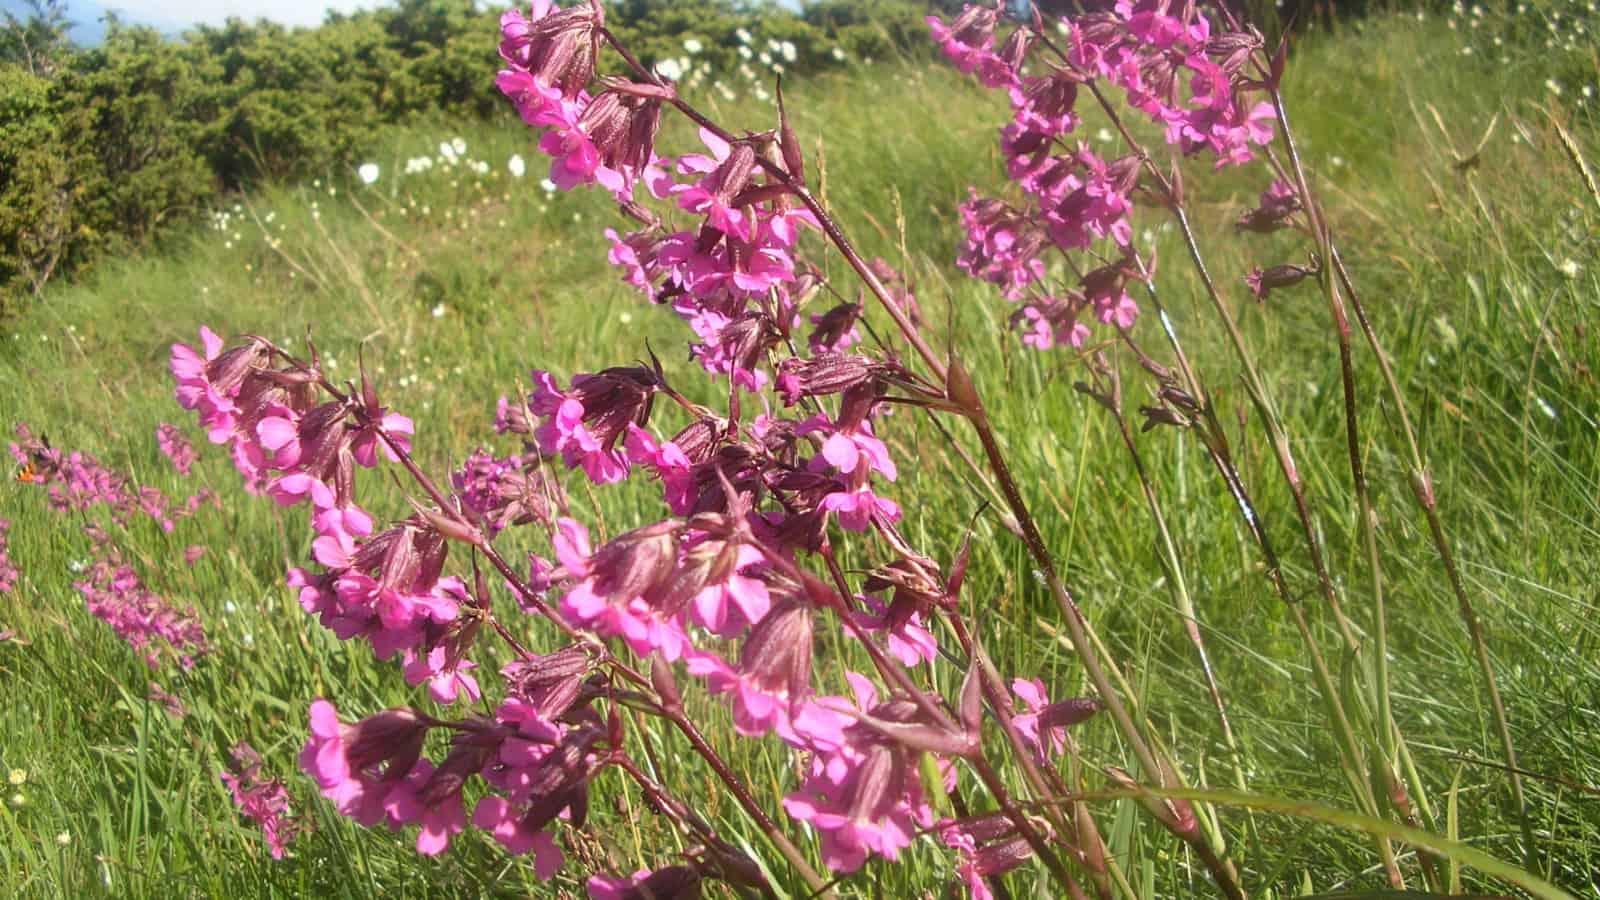 Gewöhnliche Pechnelke (Viscaria vulgaris/Silene viscaria) - Foto: Nationalpark Zentralbalkan/Stoyan Hristov